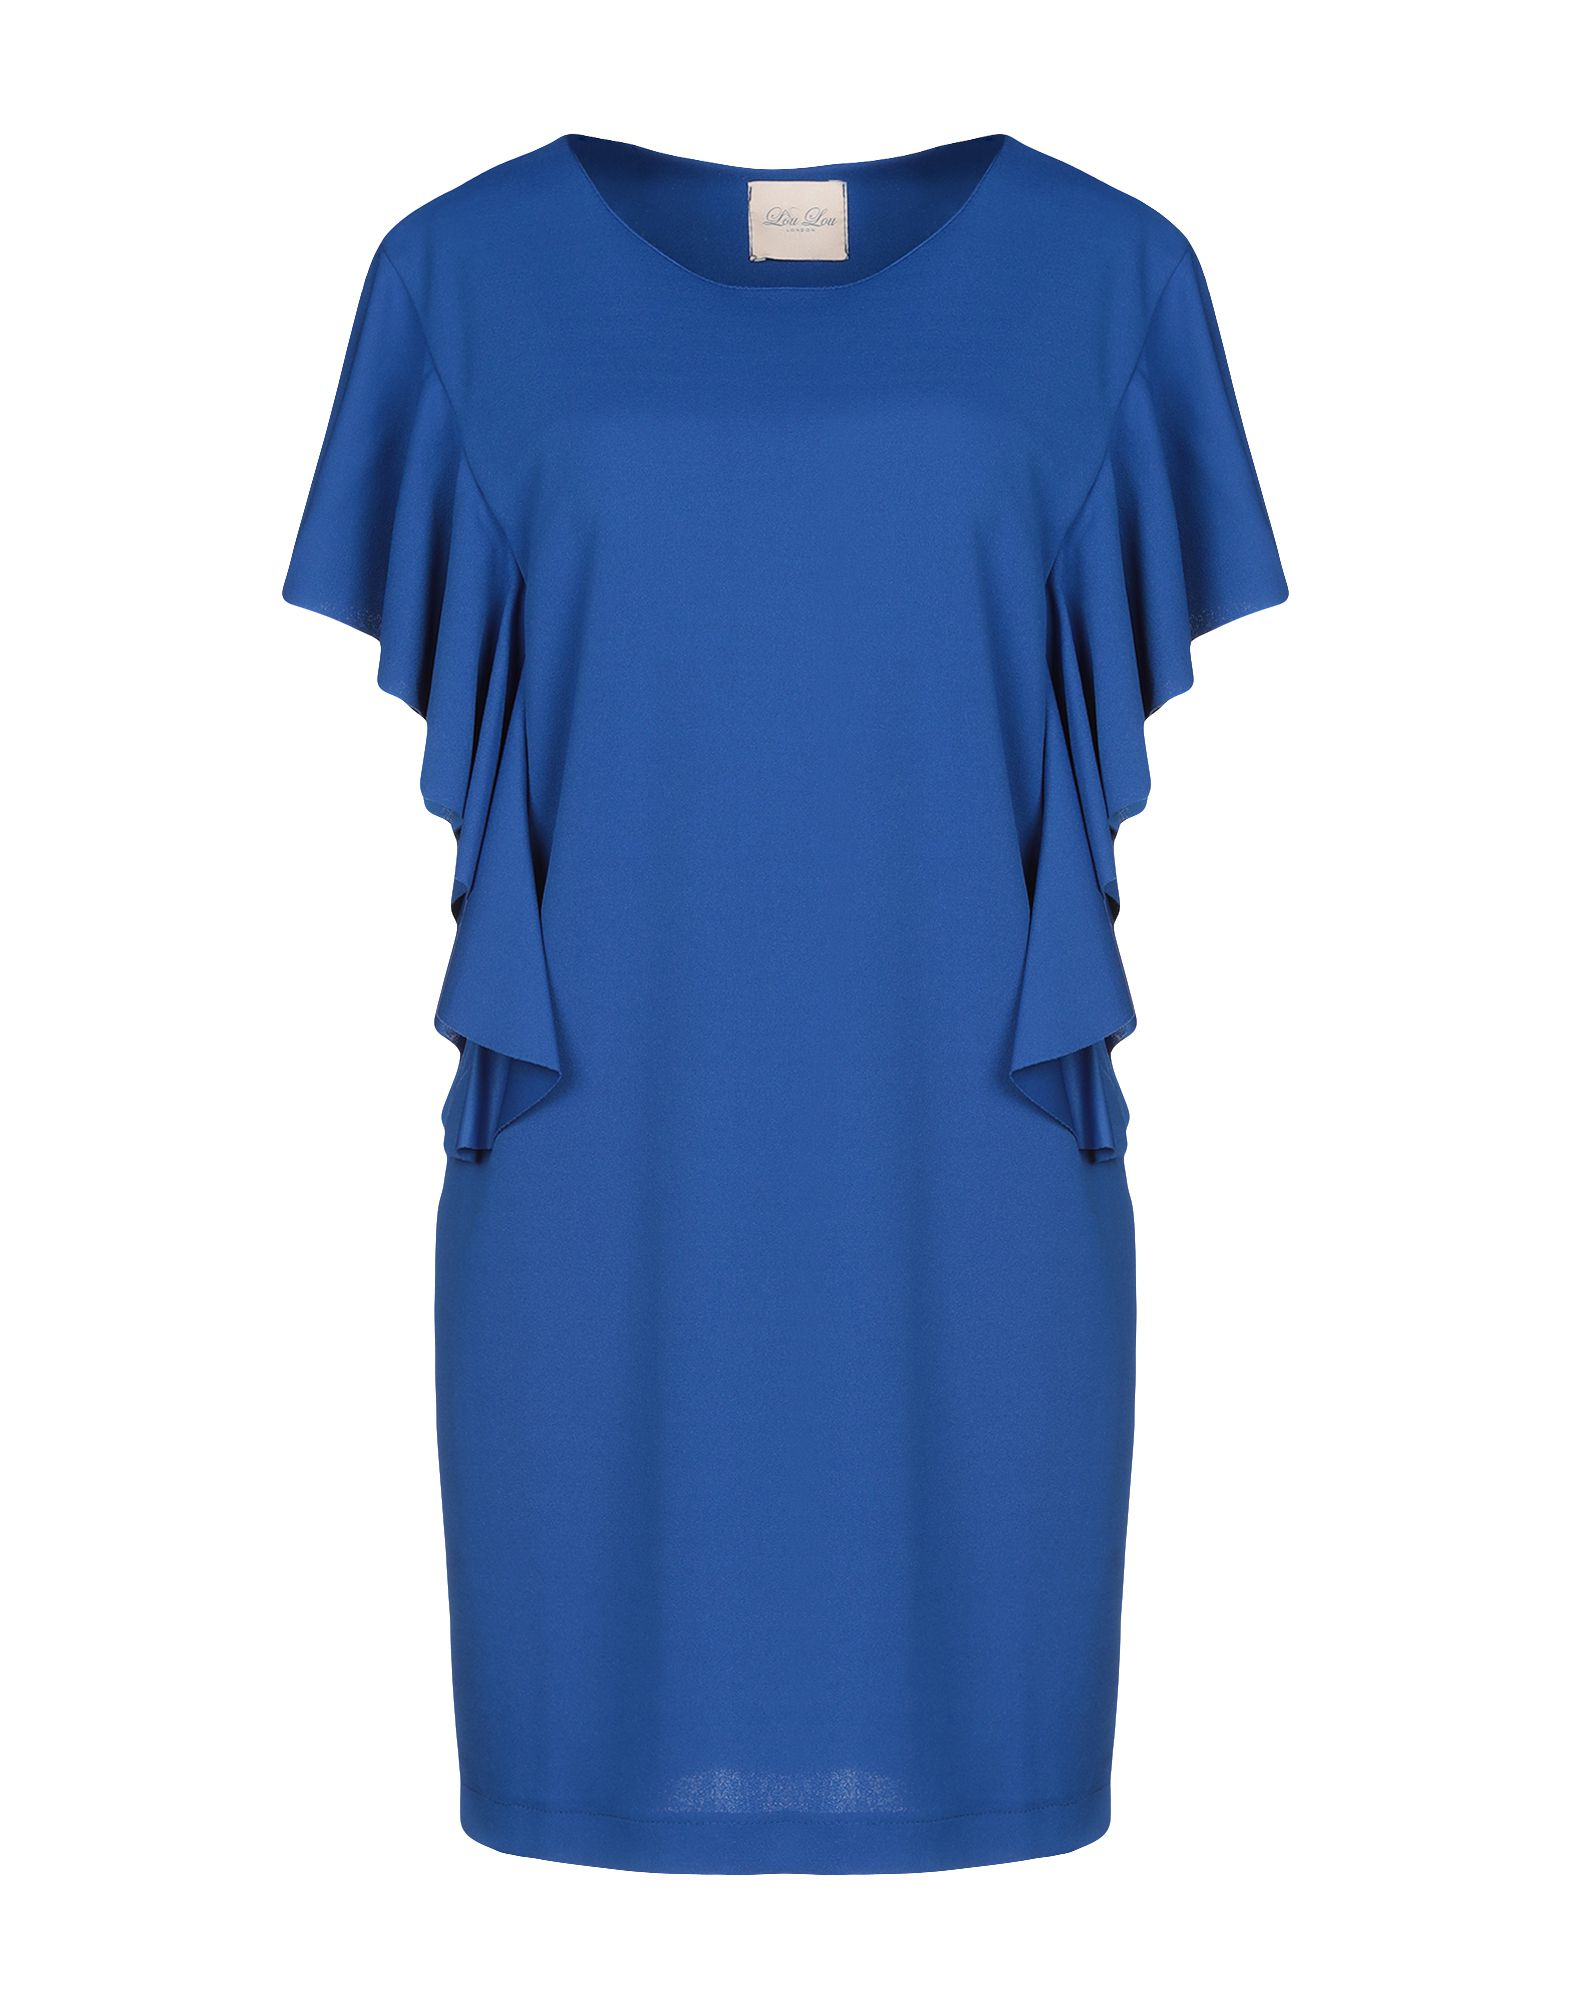 LOU LOU LONDON Короткое платье everflo lou lou meloni blue синий